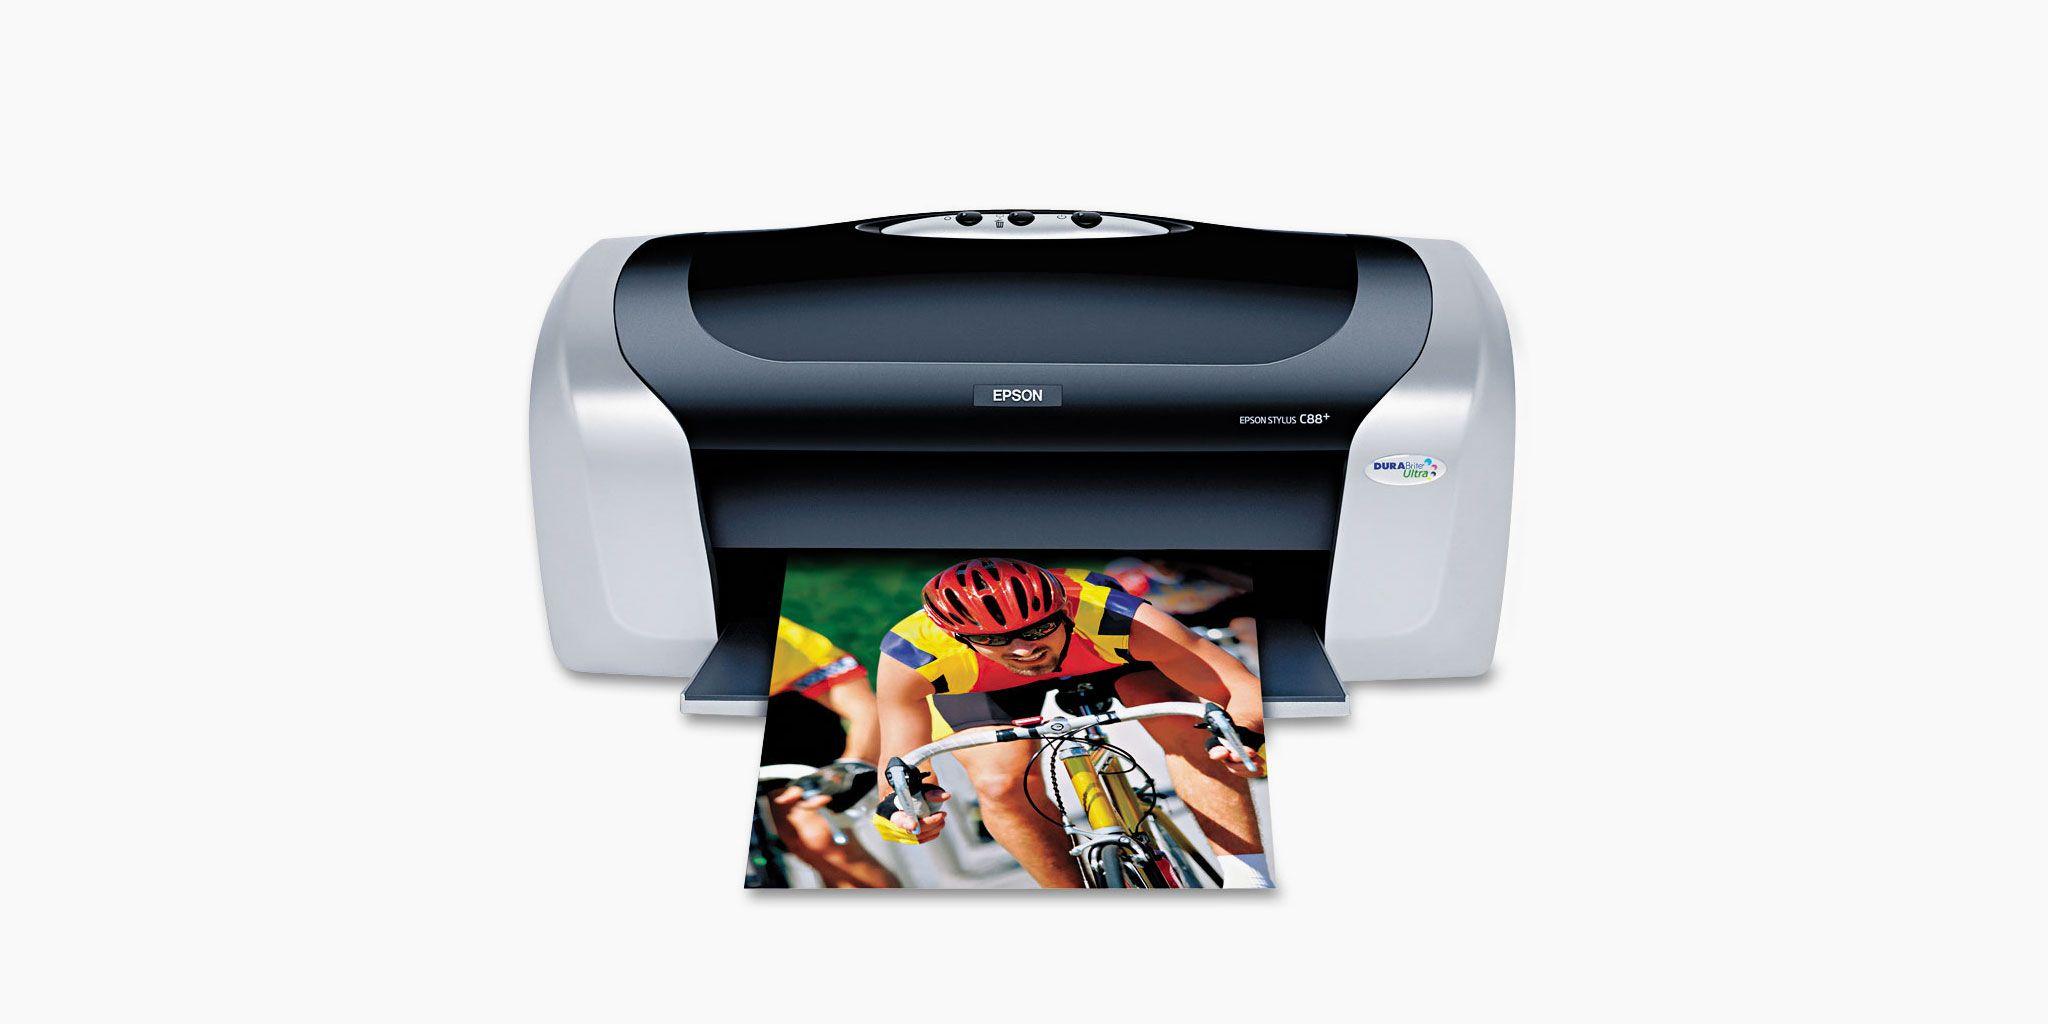 Best Printer for Heat Transfers: Epson C88+ | Best Heat